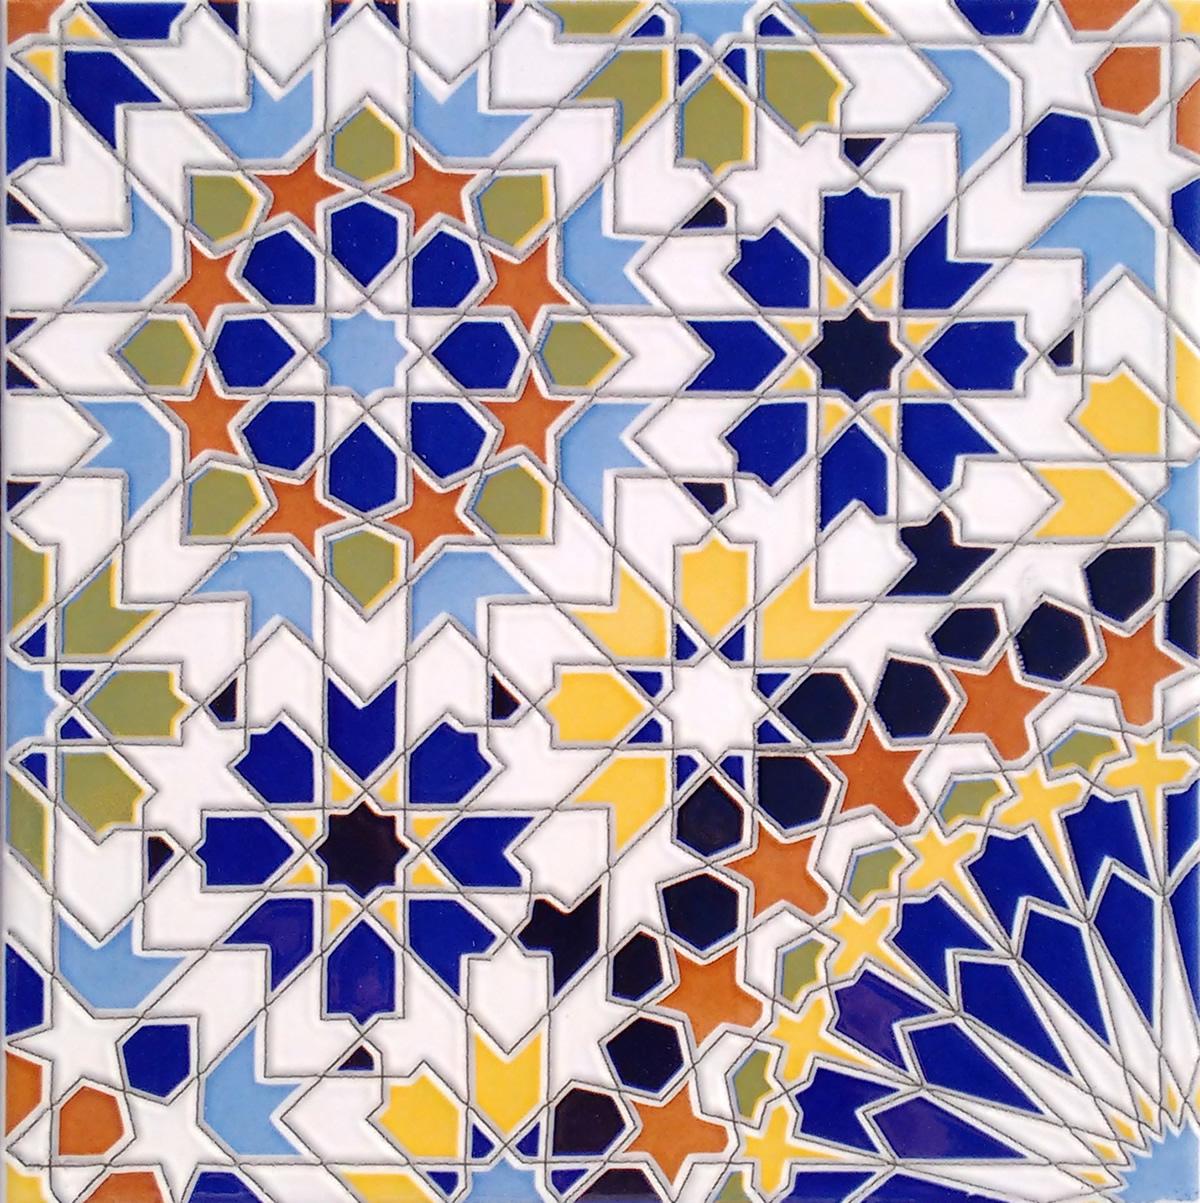 wandtegels keuken flevoland : Marokkaanse Tegels Depot Du Maroc